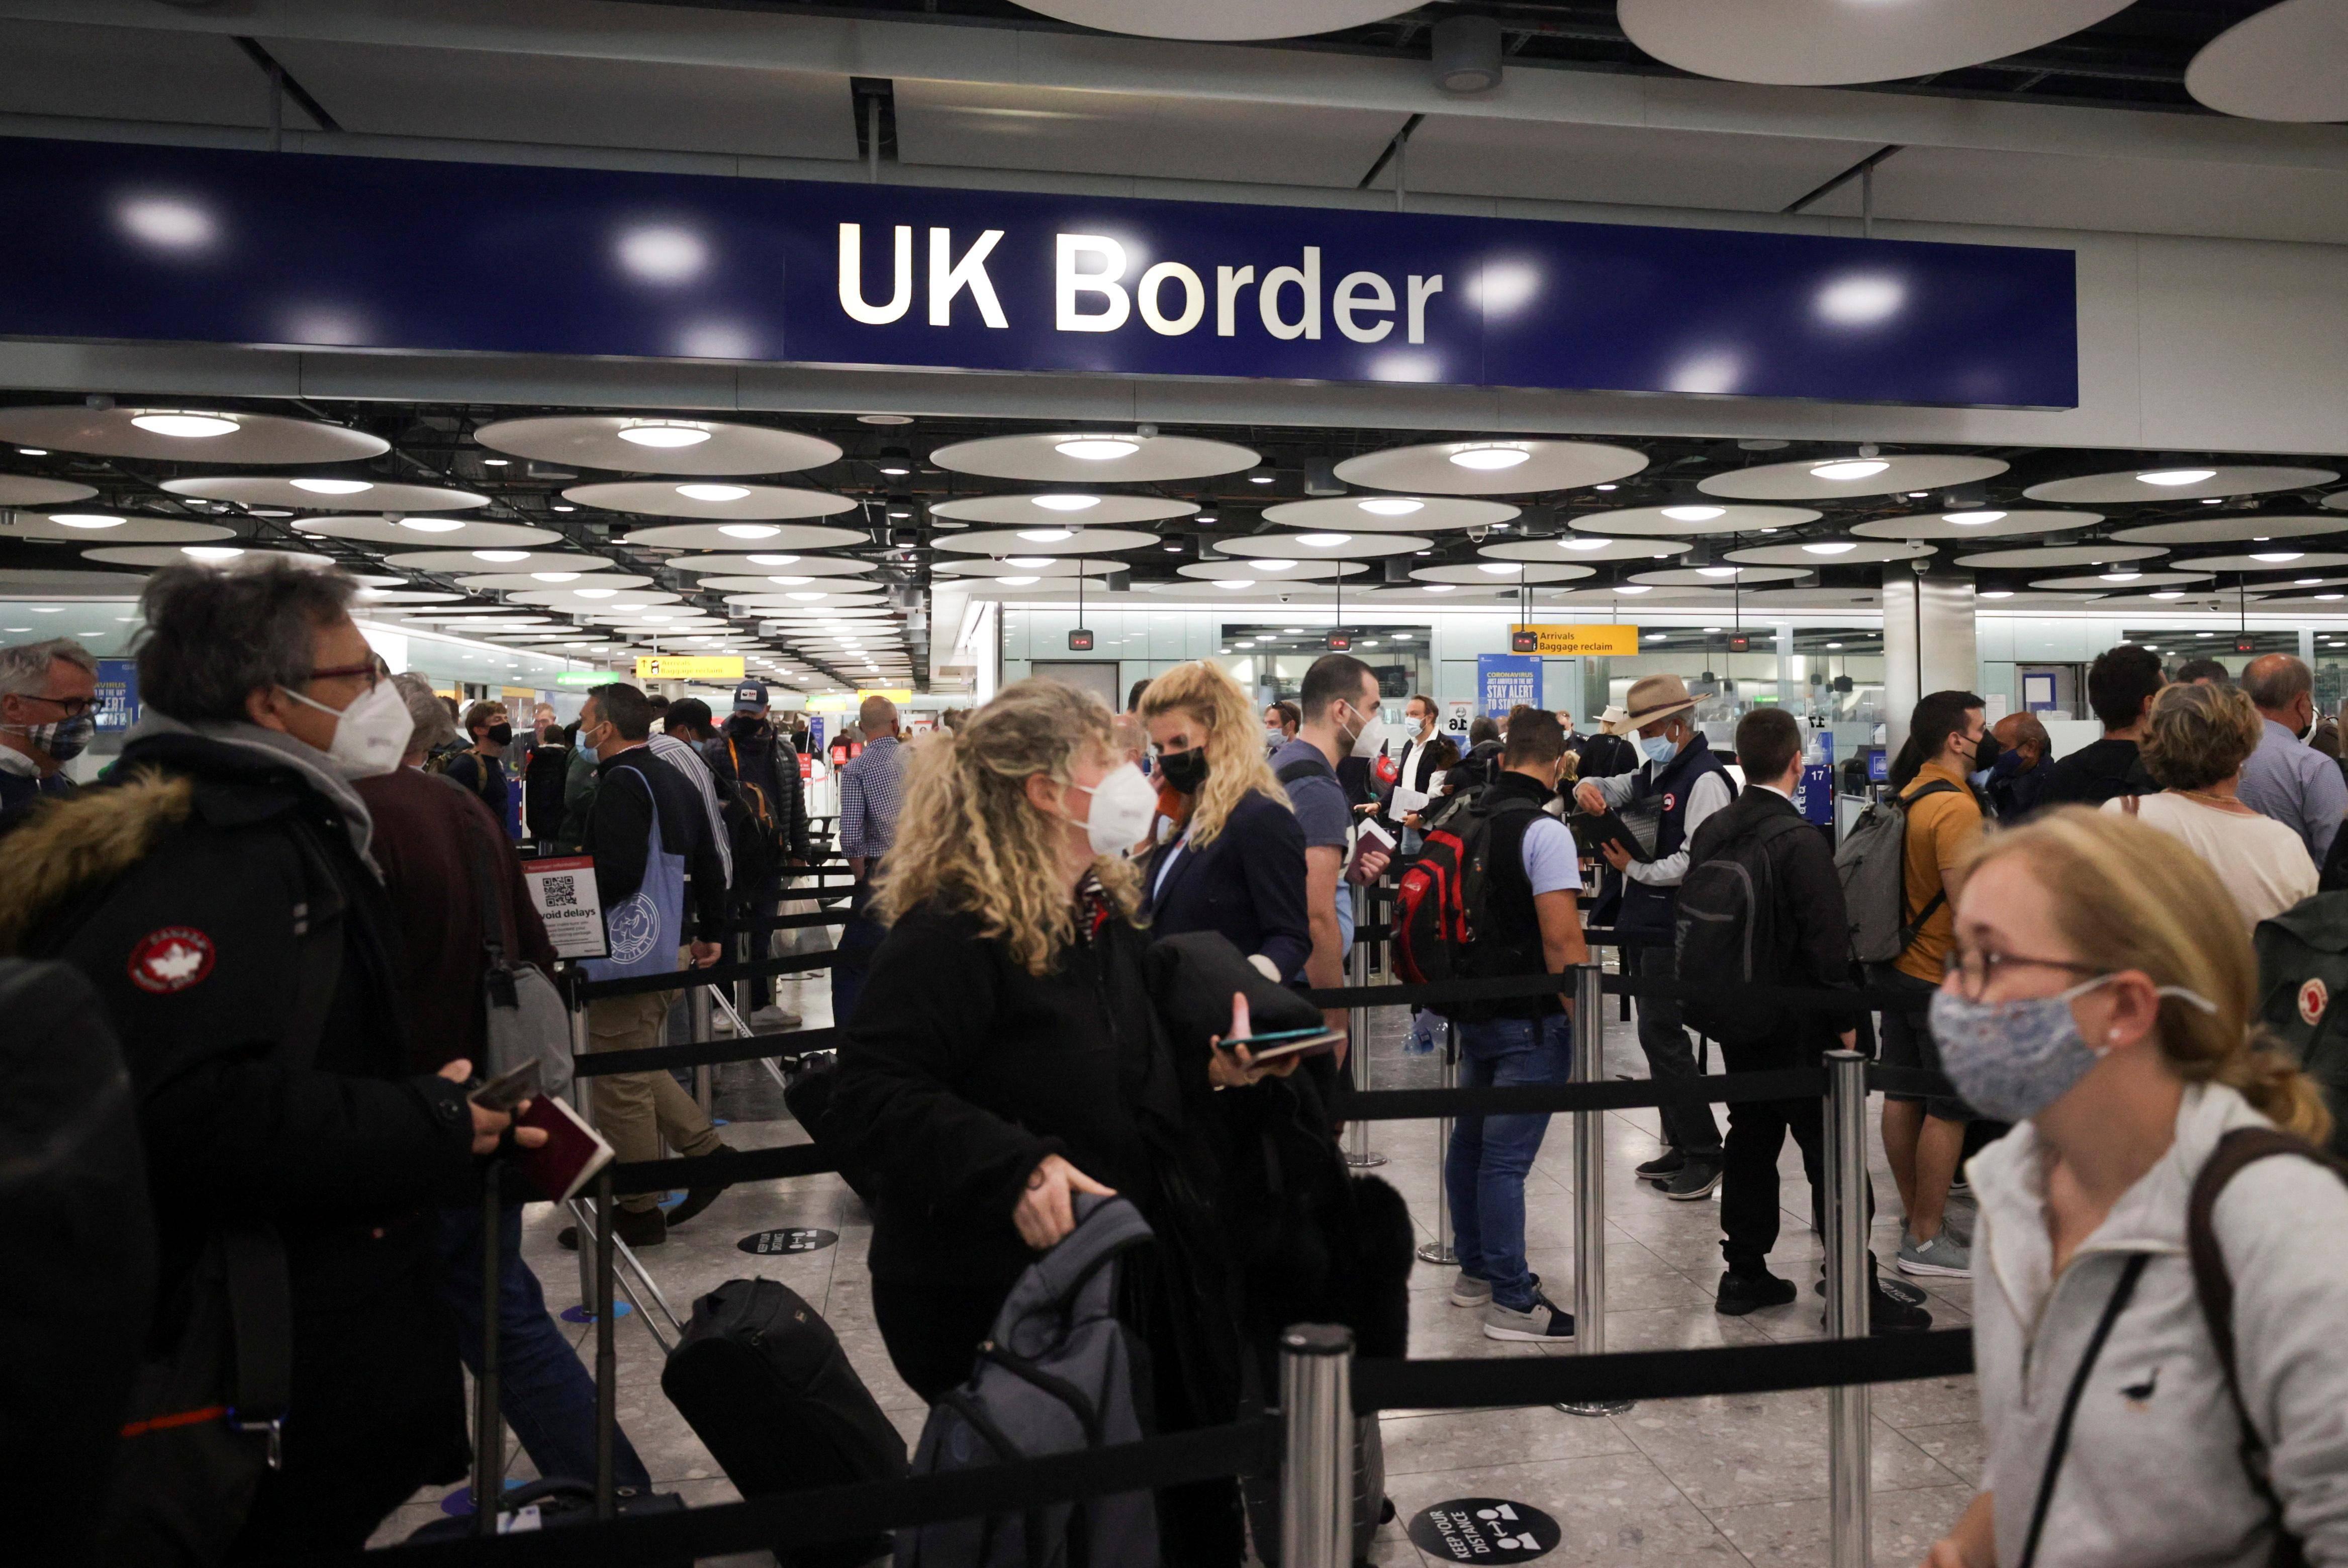 Covid-19: UK says it will simplify international travel rules